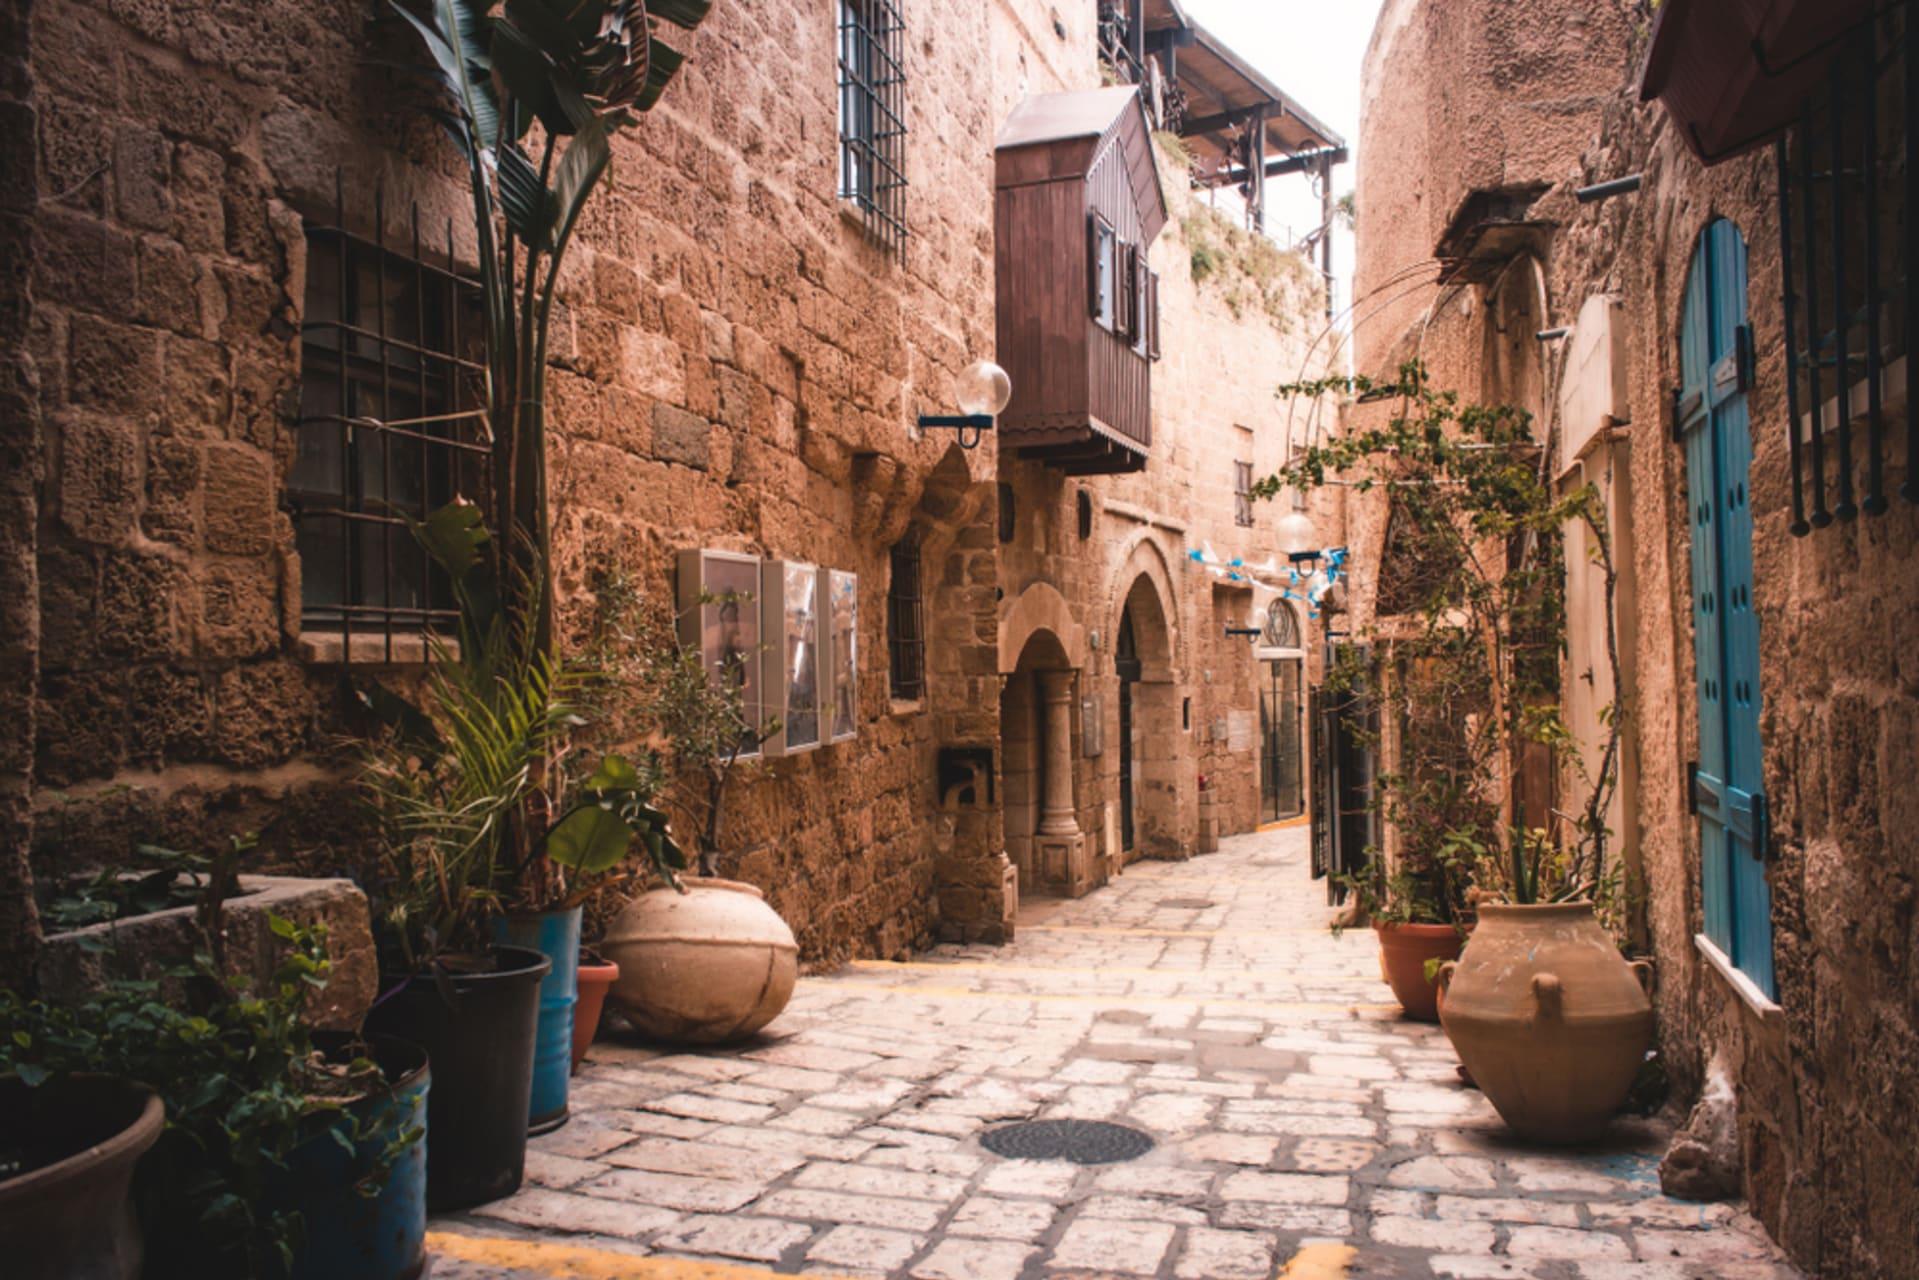 Tel Aviv - The American-German Colony of Tel Aviv